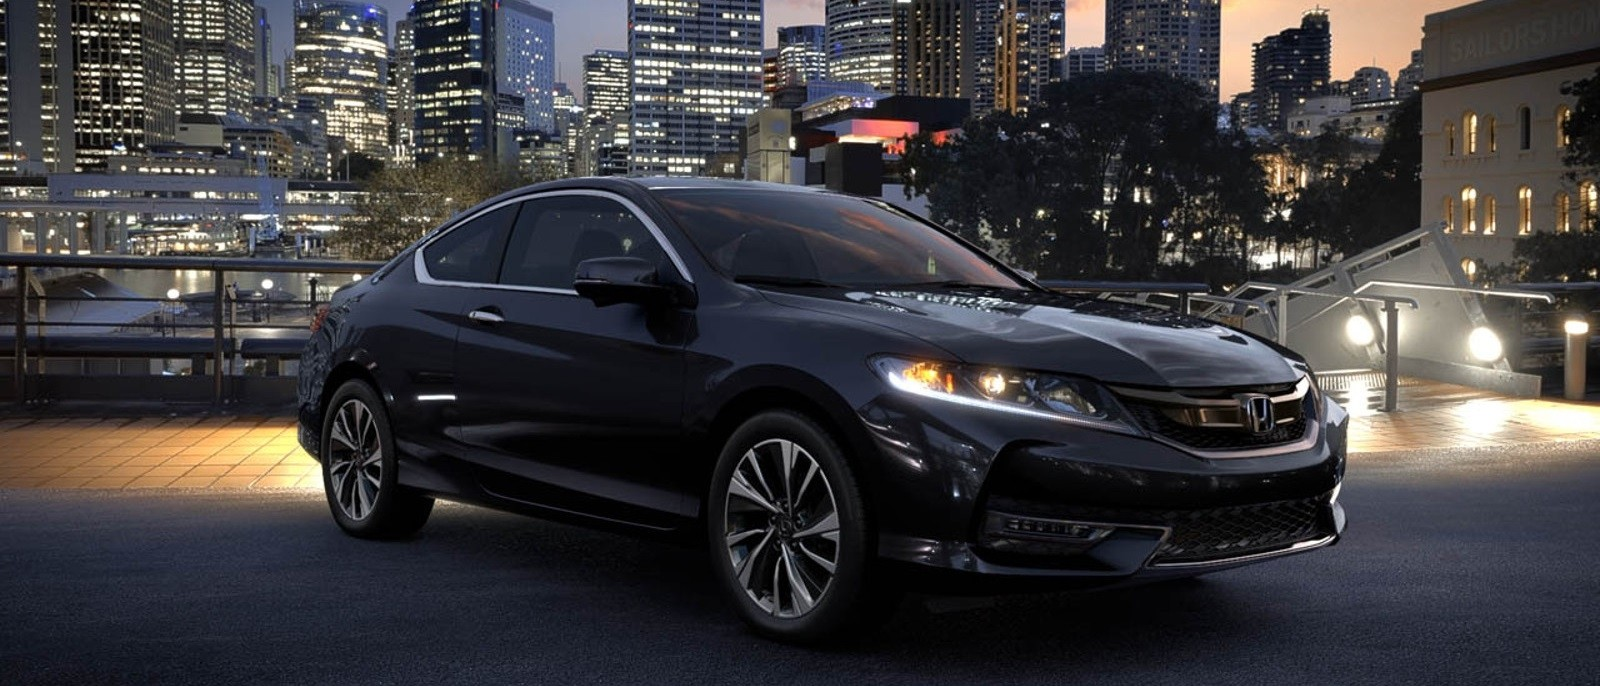 Honda-Accord-Coupe-Black